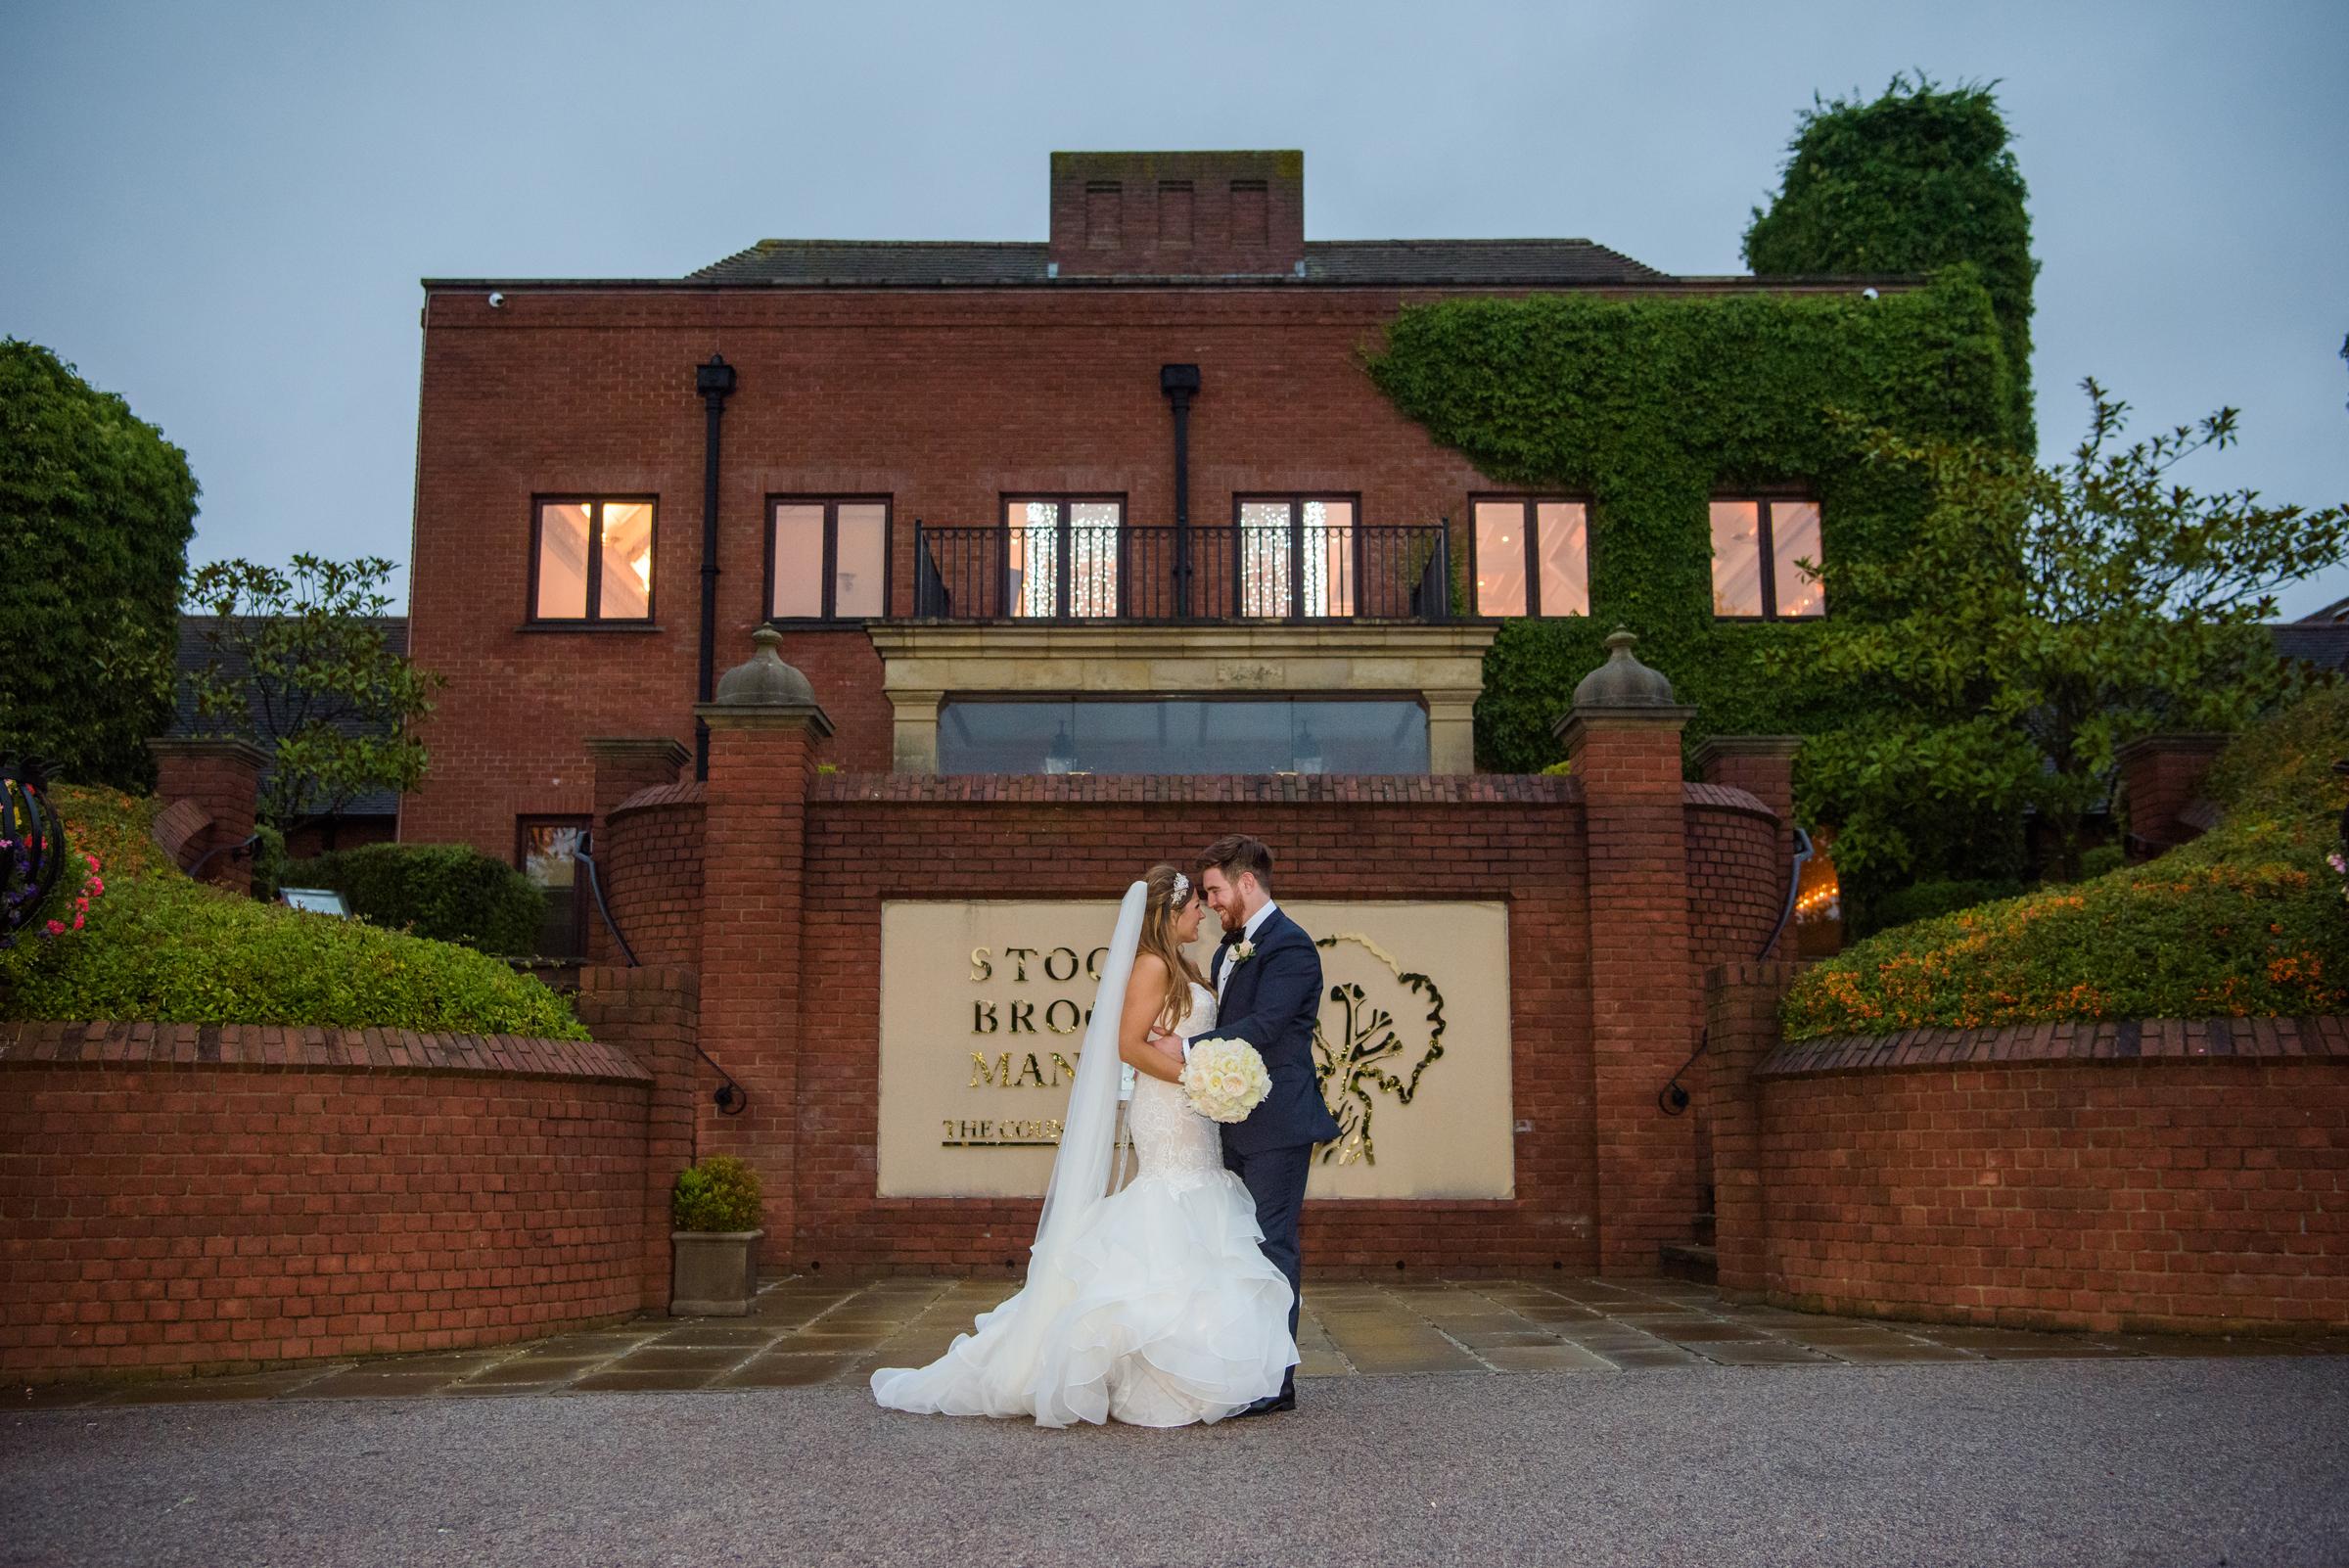 Weddings at Stock Brook Manor